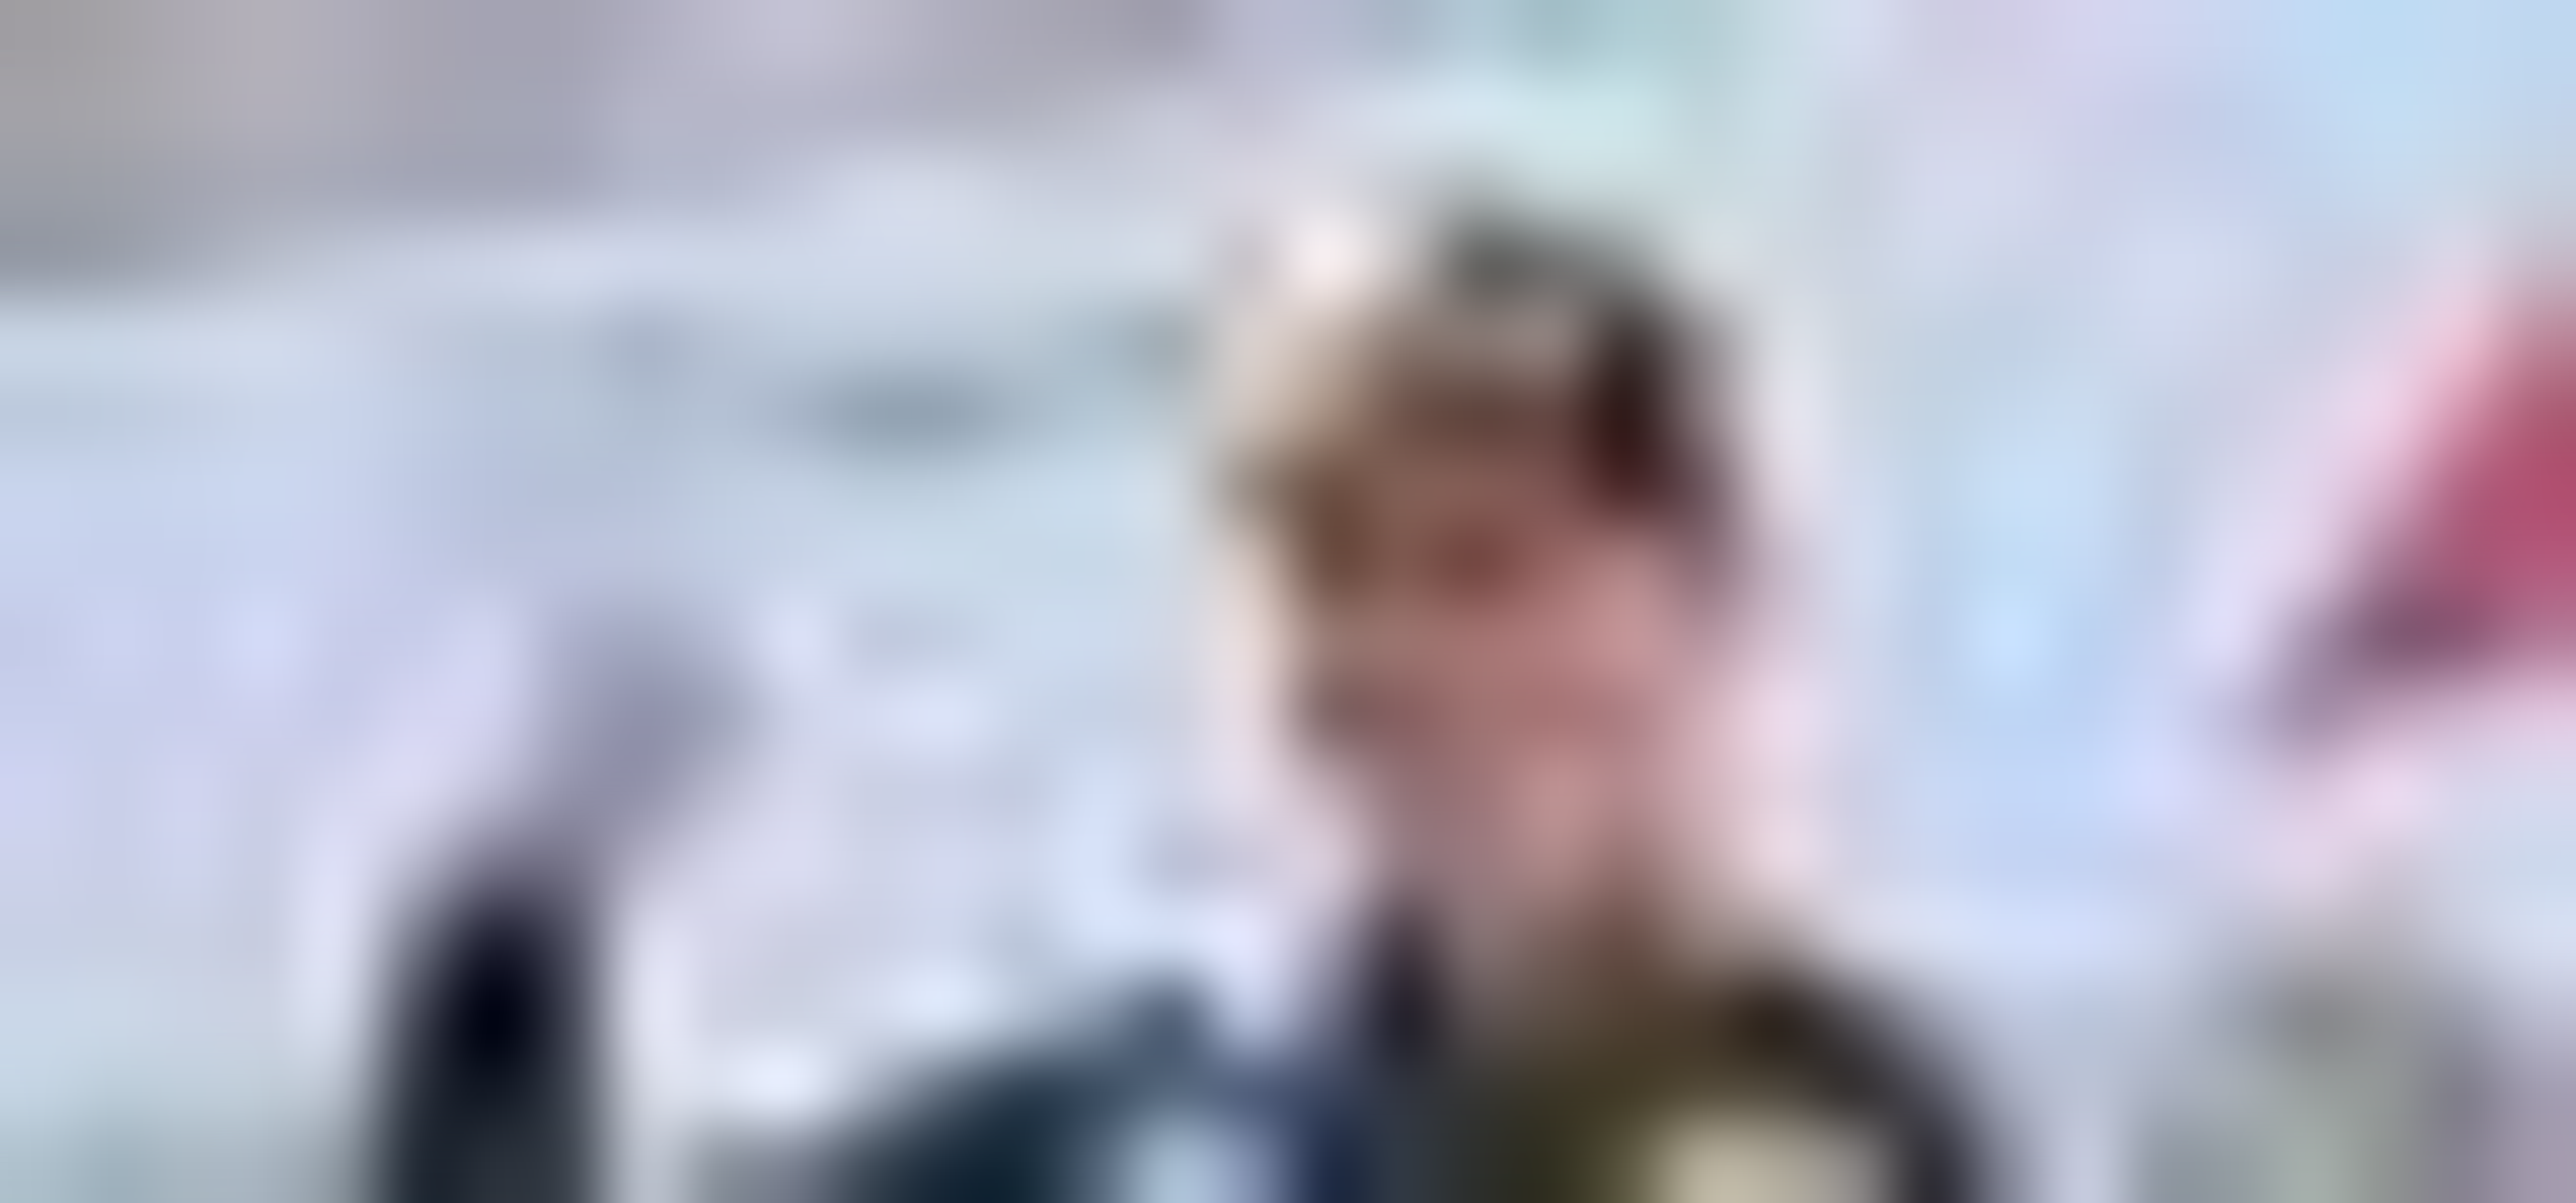 Formel 1: Red-Bull-Star Verstappen sieht sich in Top-Form